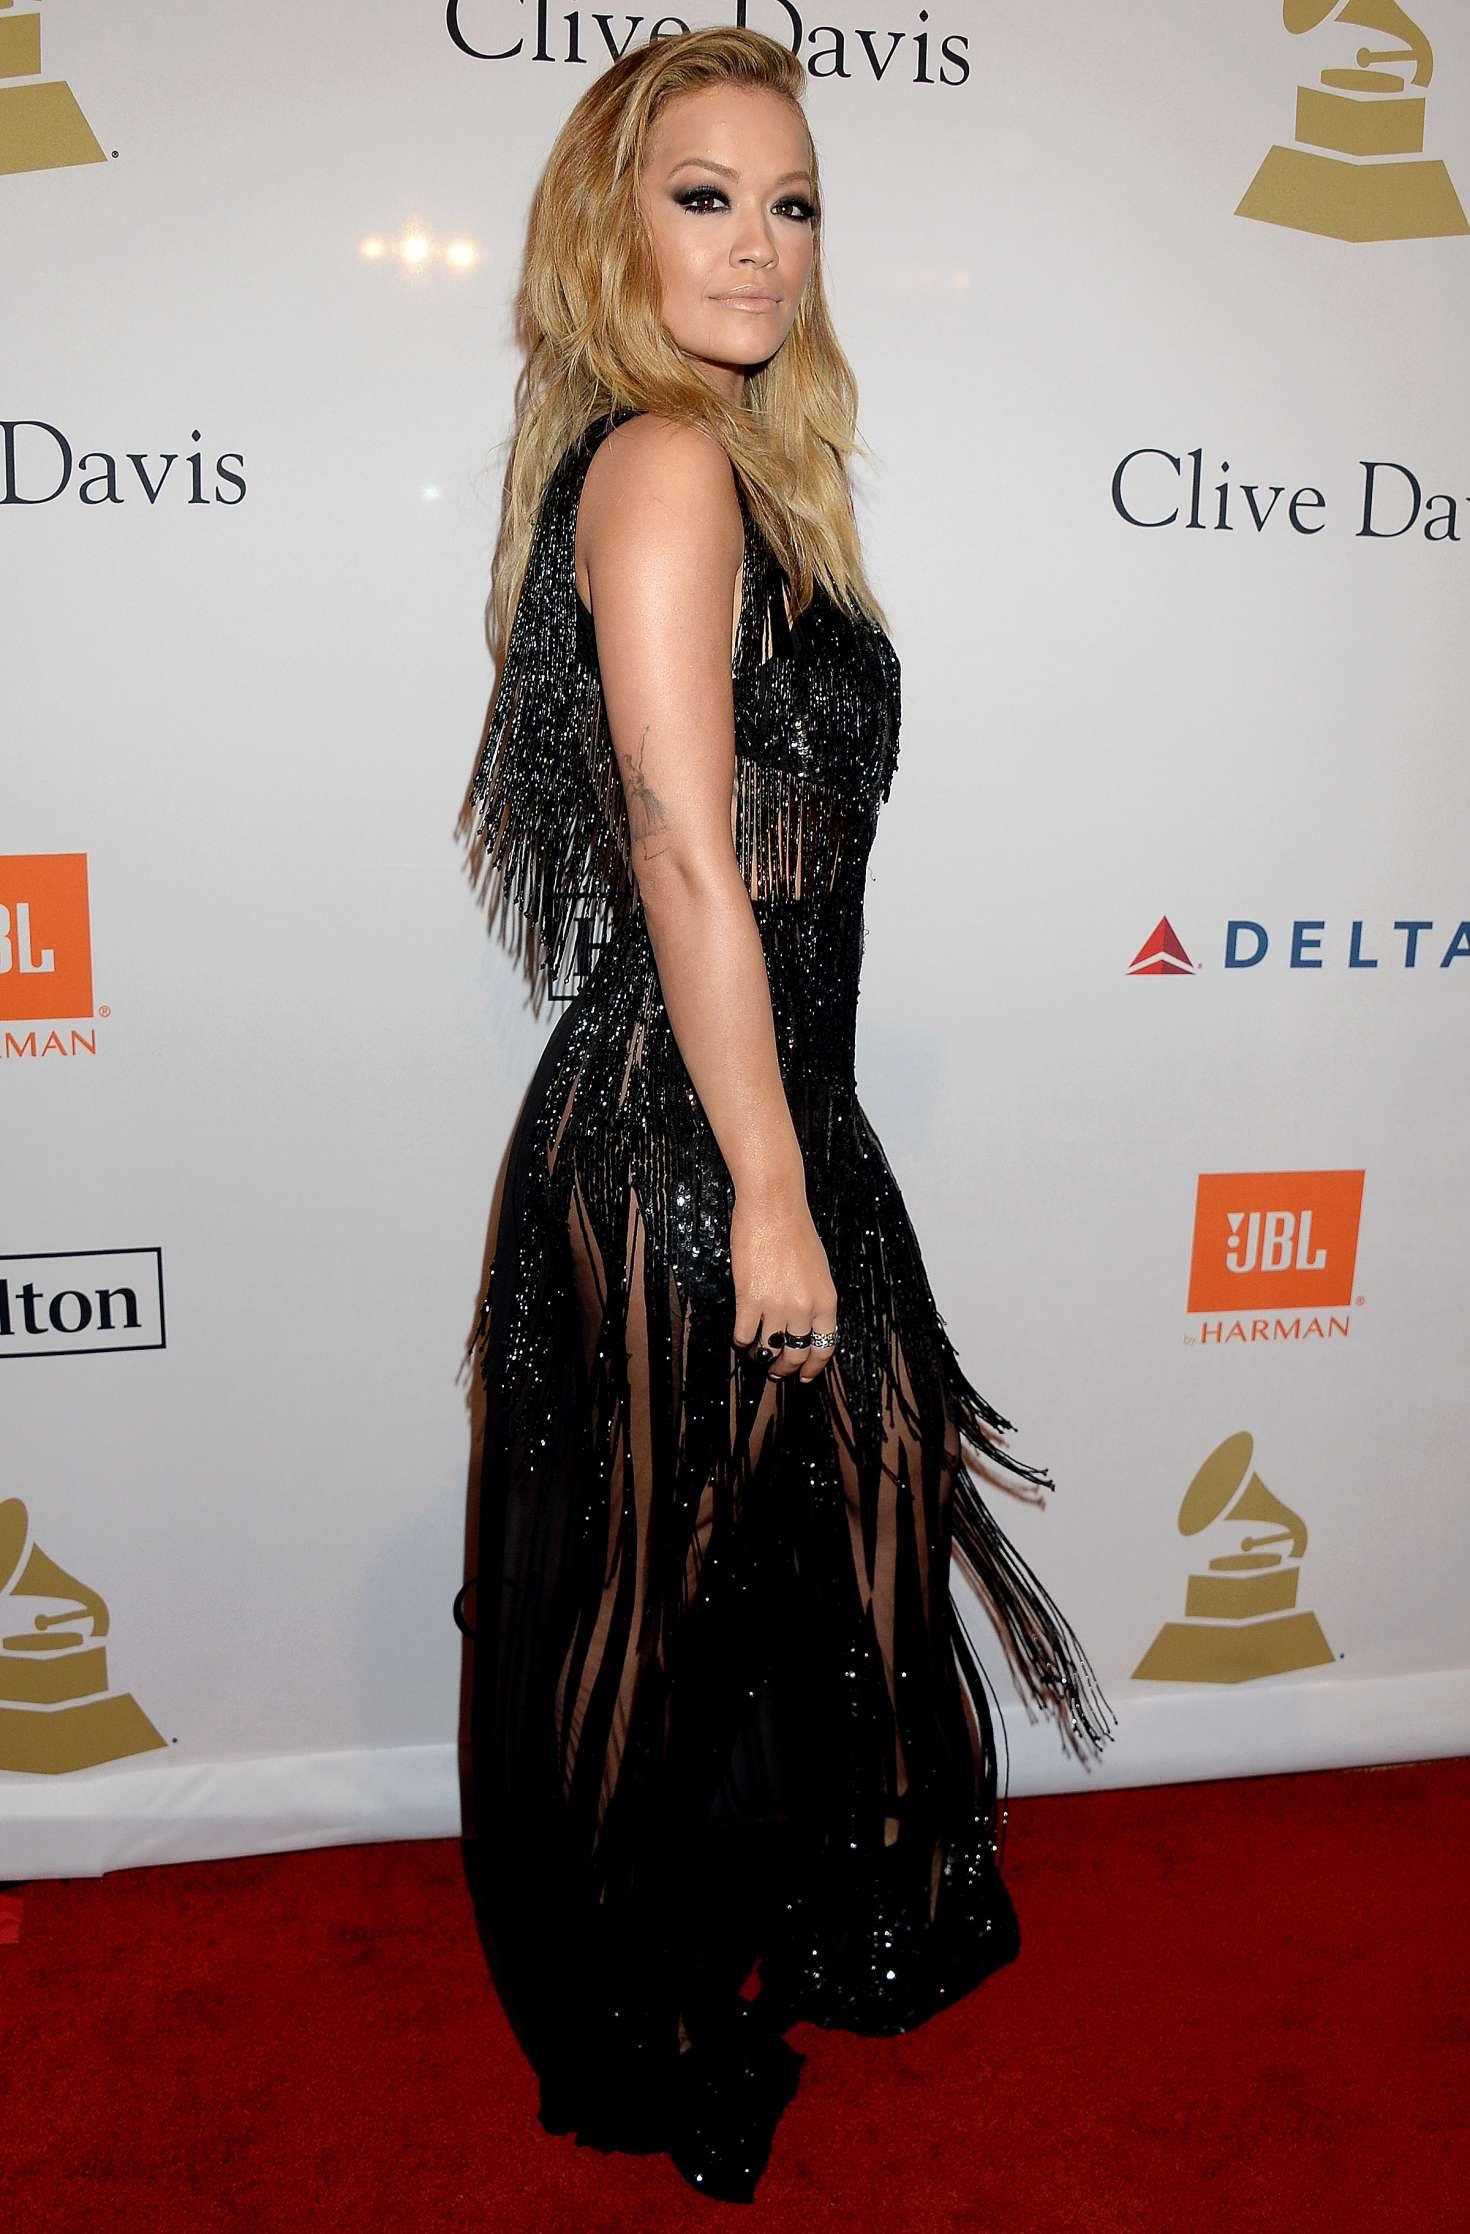 Rita Ora 2017 : Rita Ora: Clive Davis Pre-Grammy Party 2017 -02